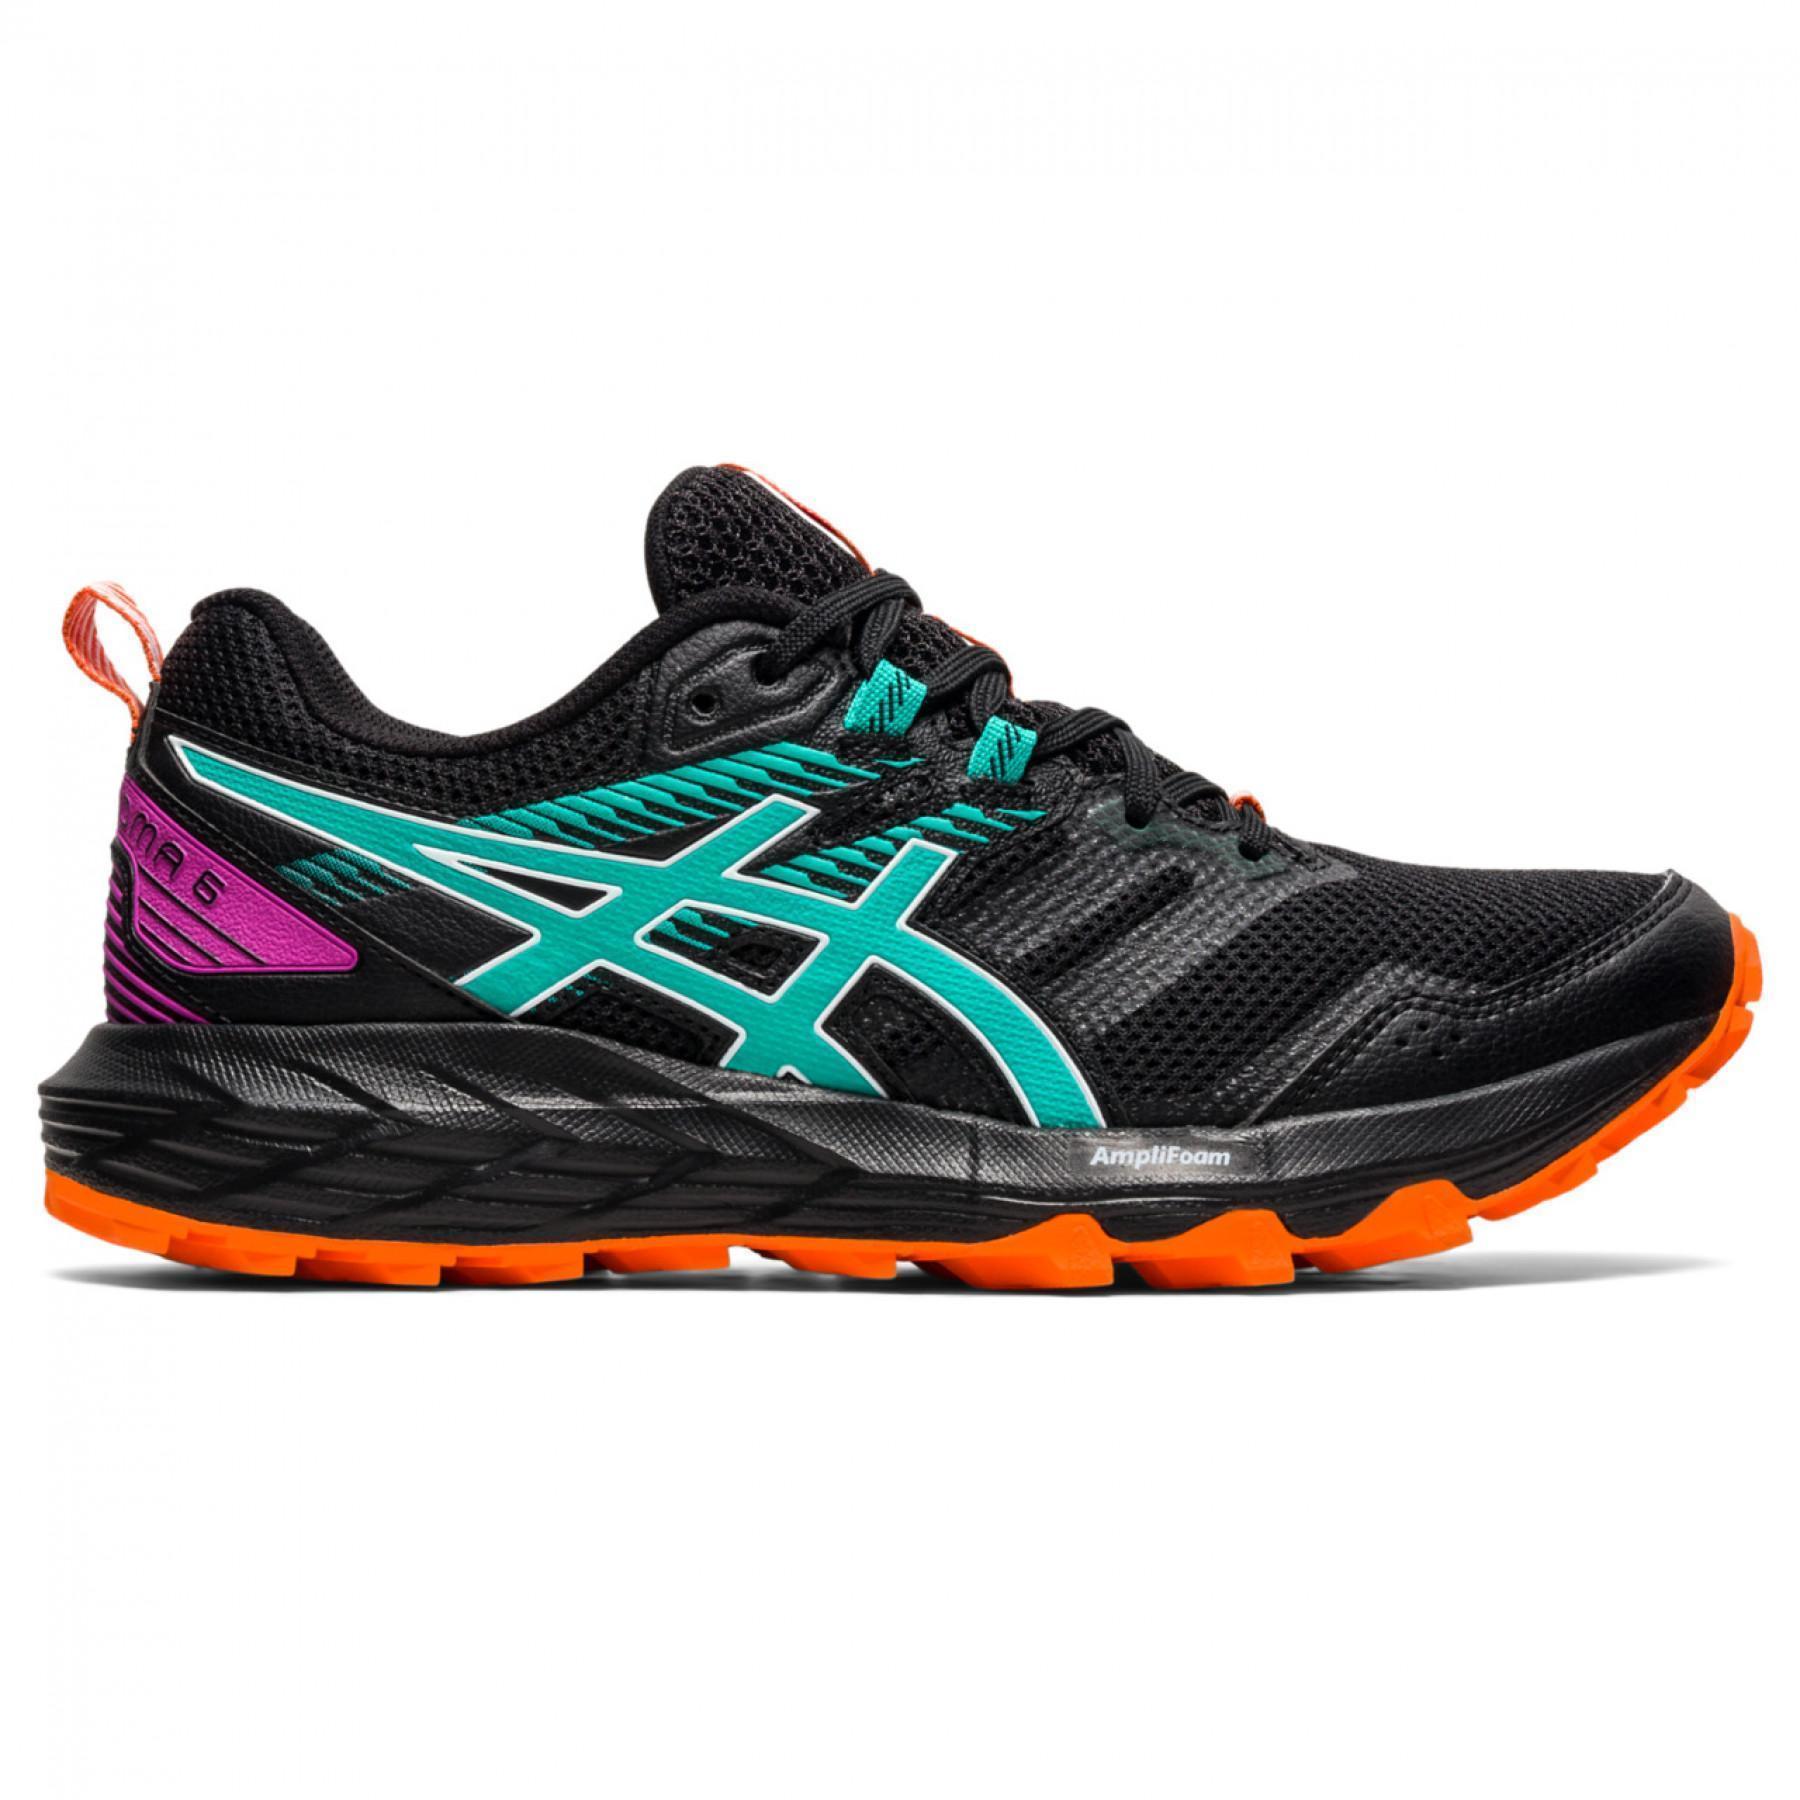 Asics Gel-Sonoma 6 Women's Shoes